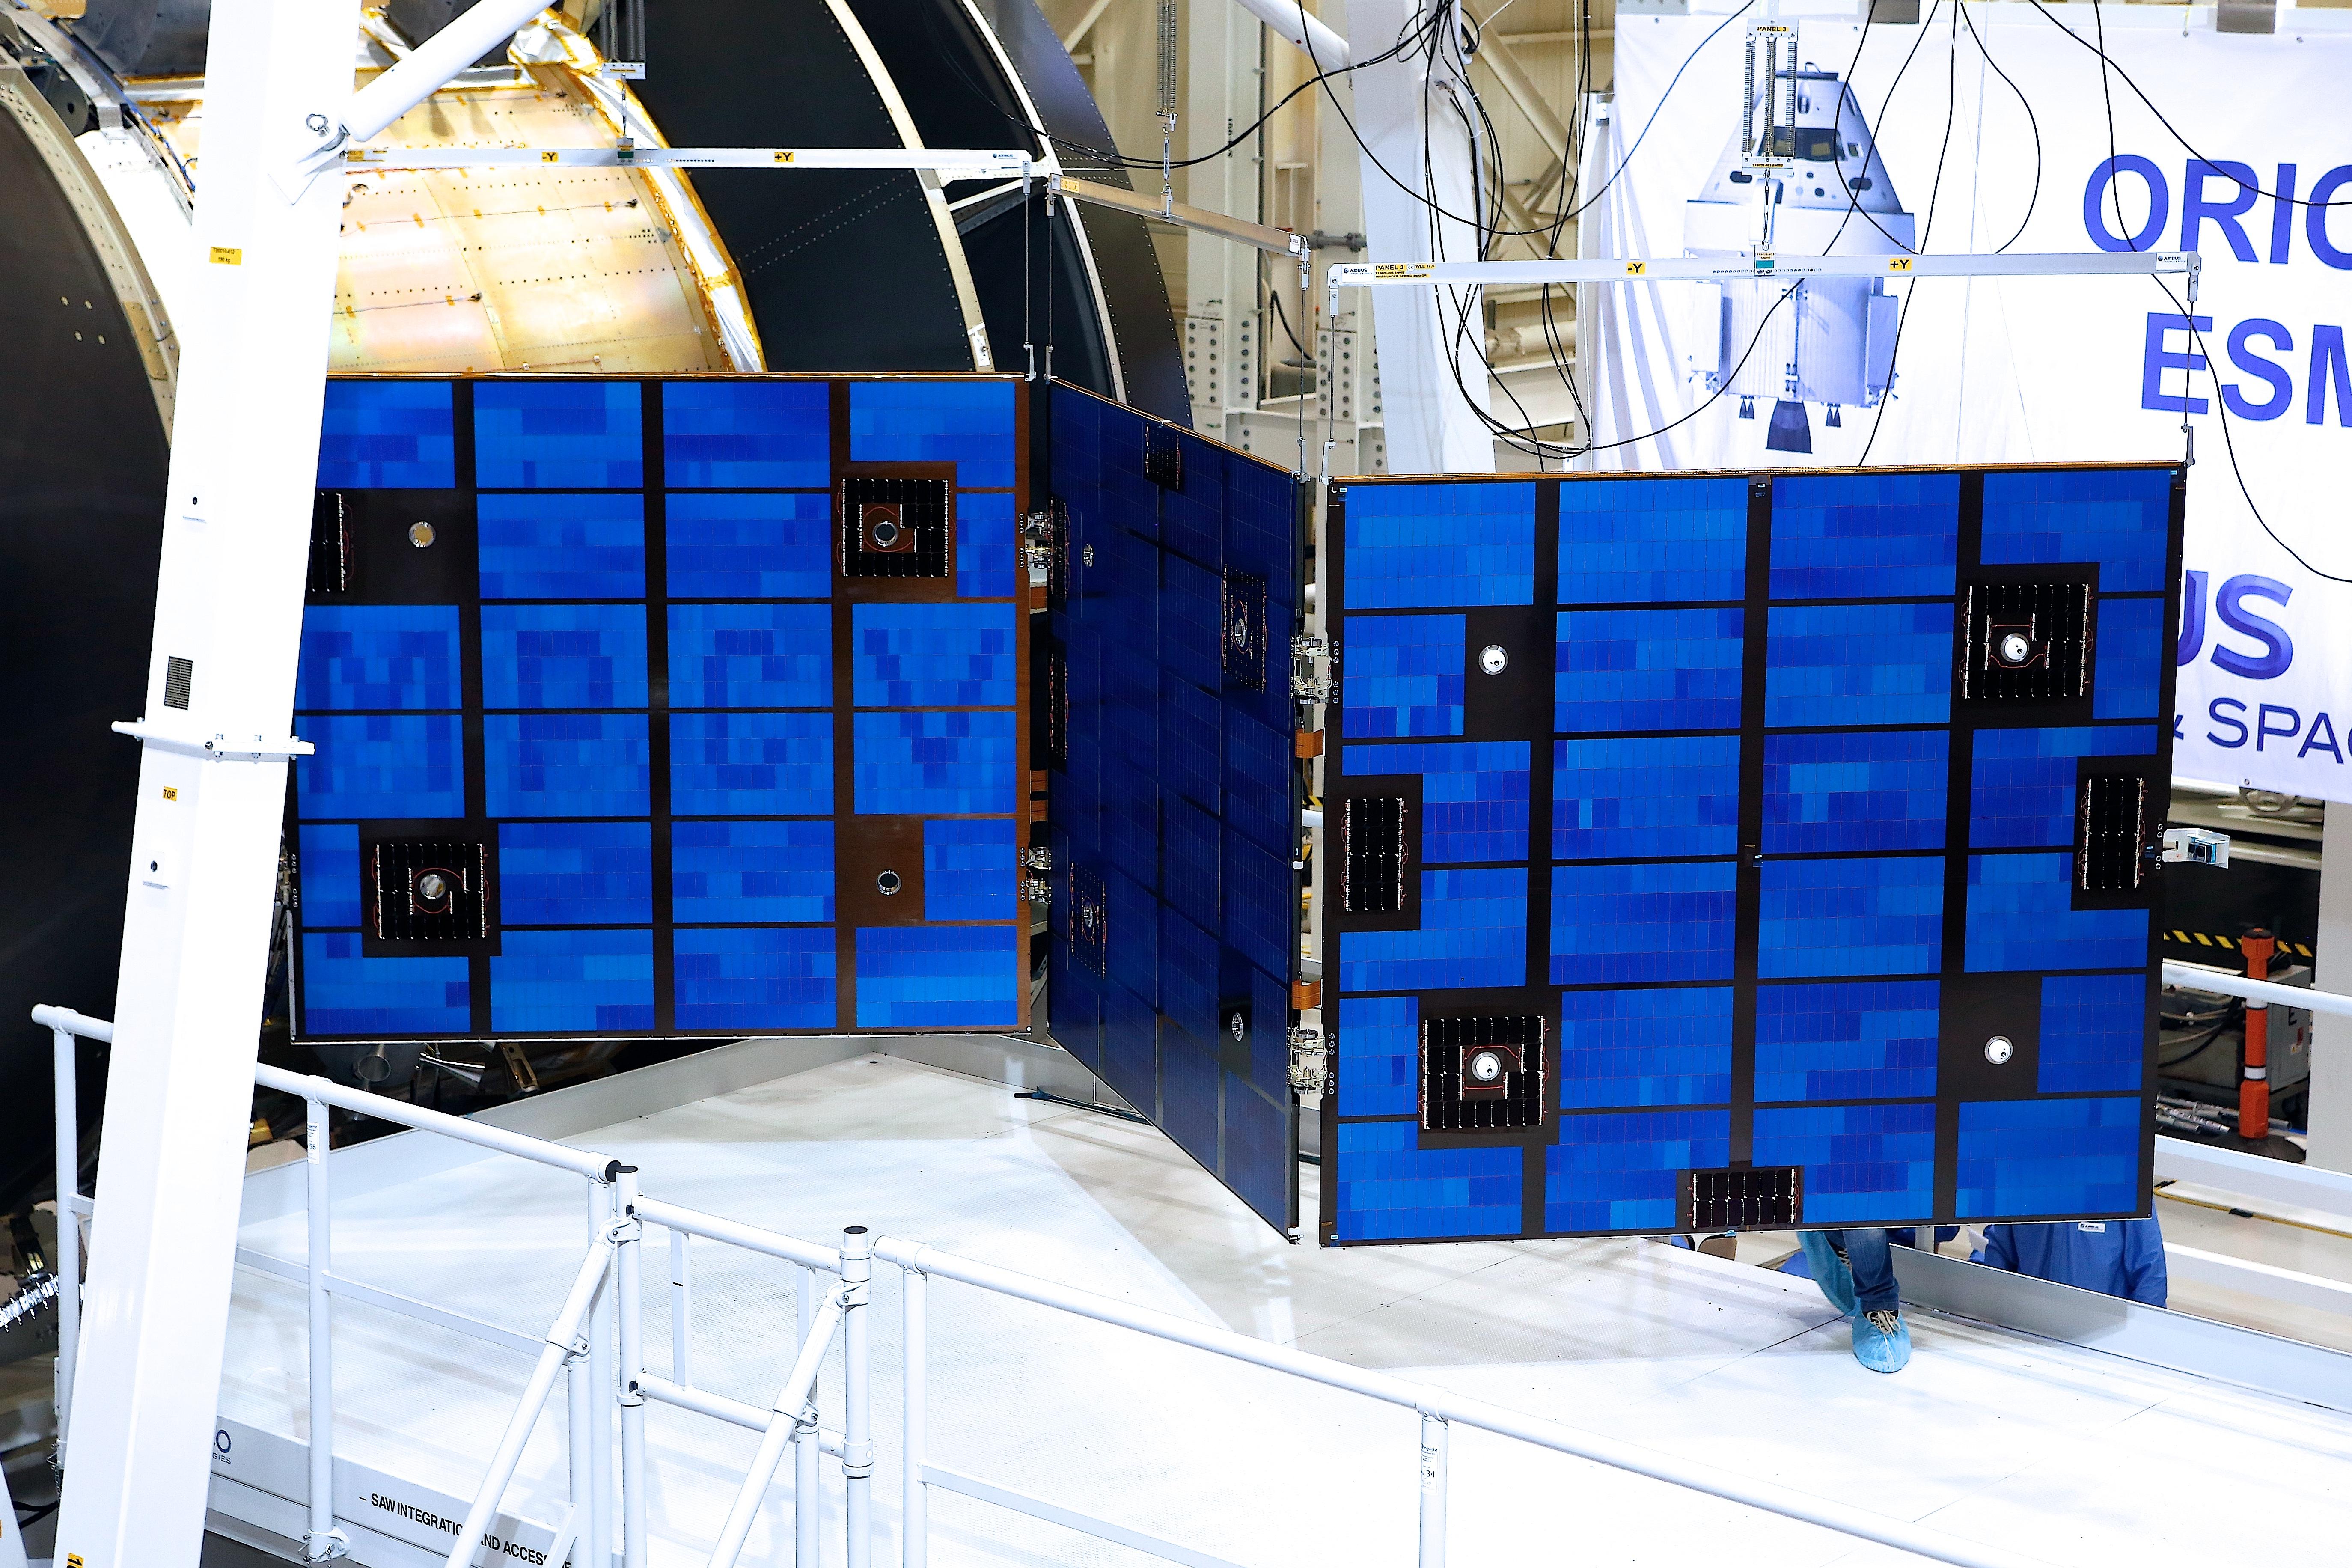 Orion European Service Module An International